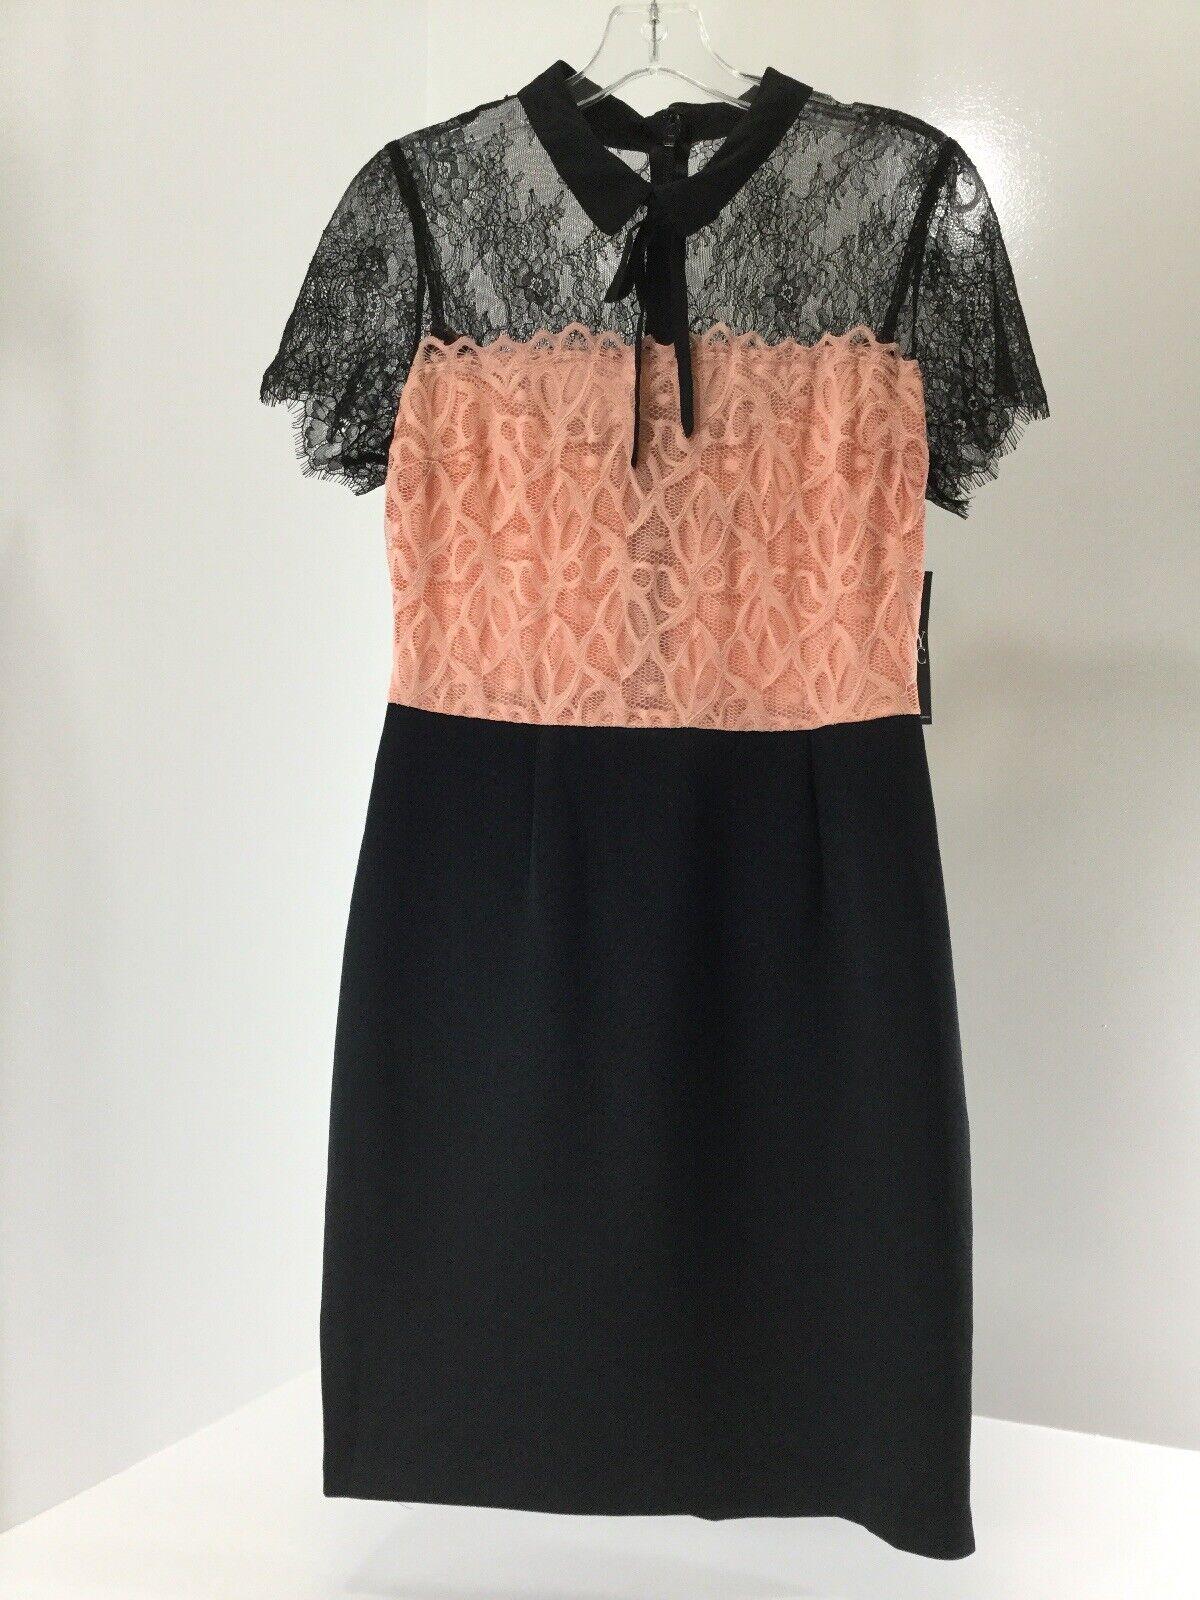 NY & C damen Short Sleeve Eyelash Lace Dress schwarz Salmon Rosa Sz Medium NWT @